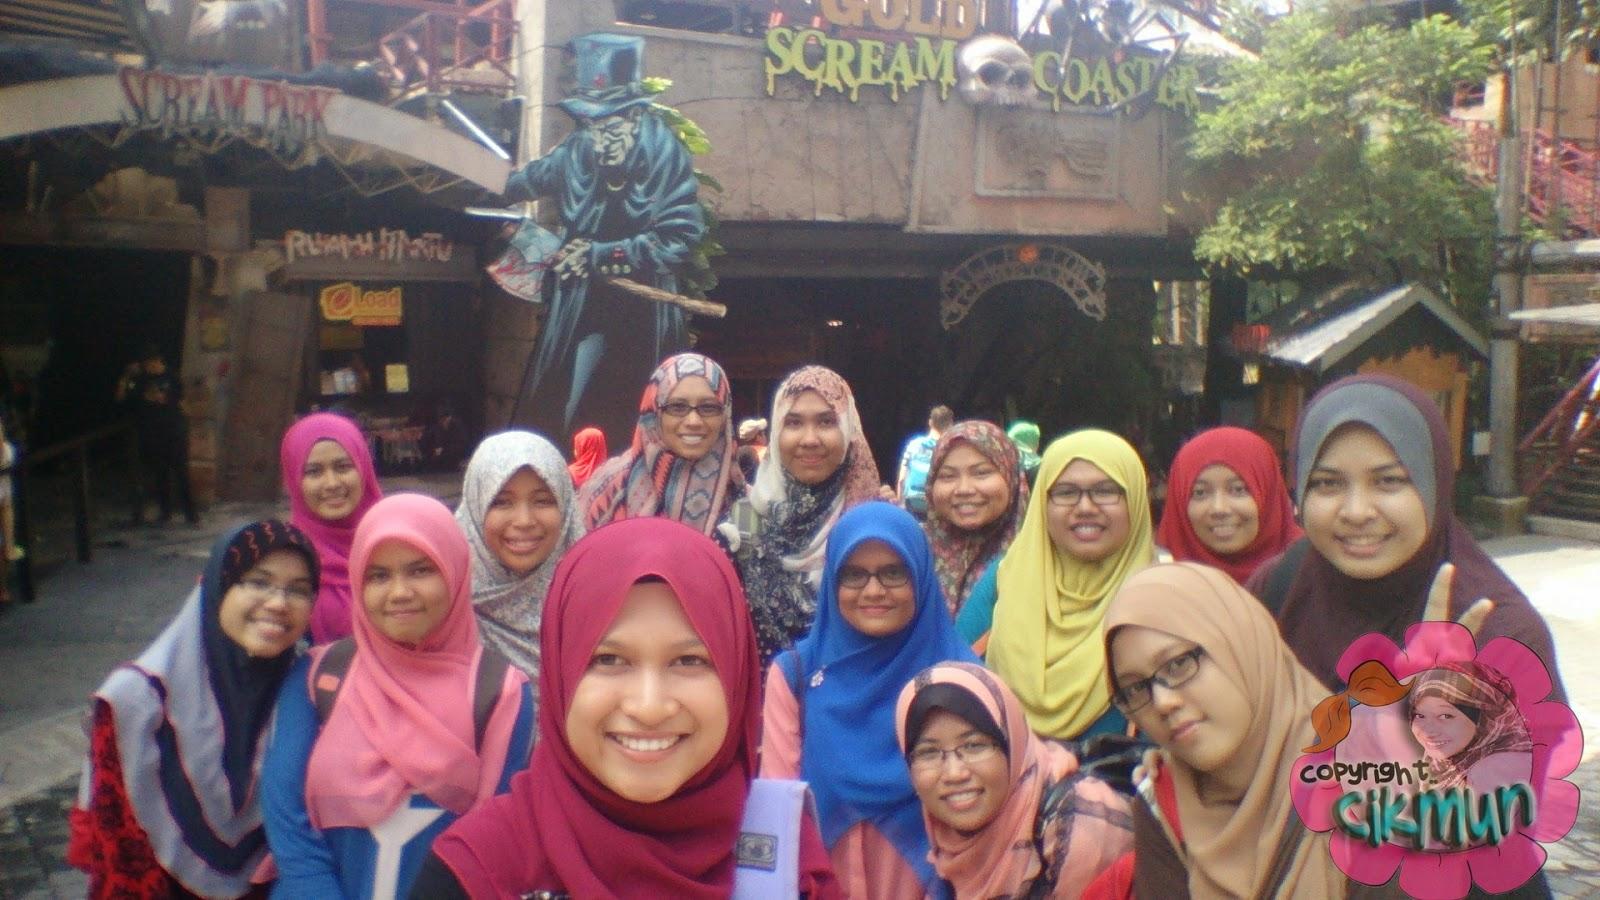 classtrip, sunway lagoon, sunway pyramid, HS245, citer mun~, jejalan, themepark, occupational therapy, cuti-cuti malaysia,